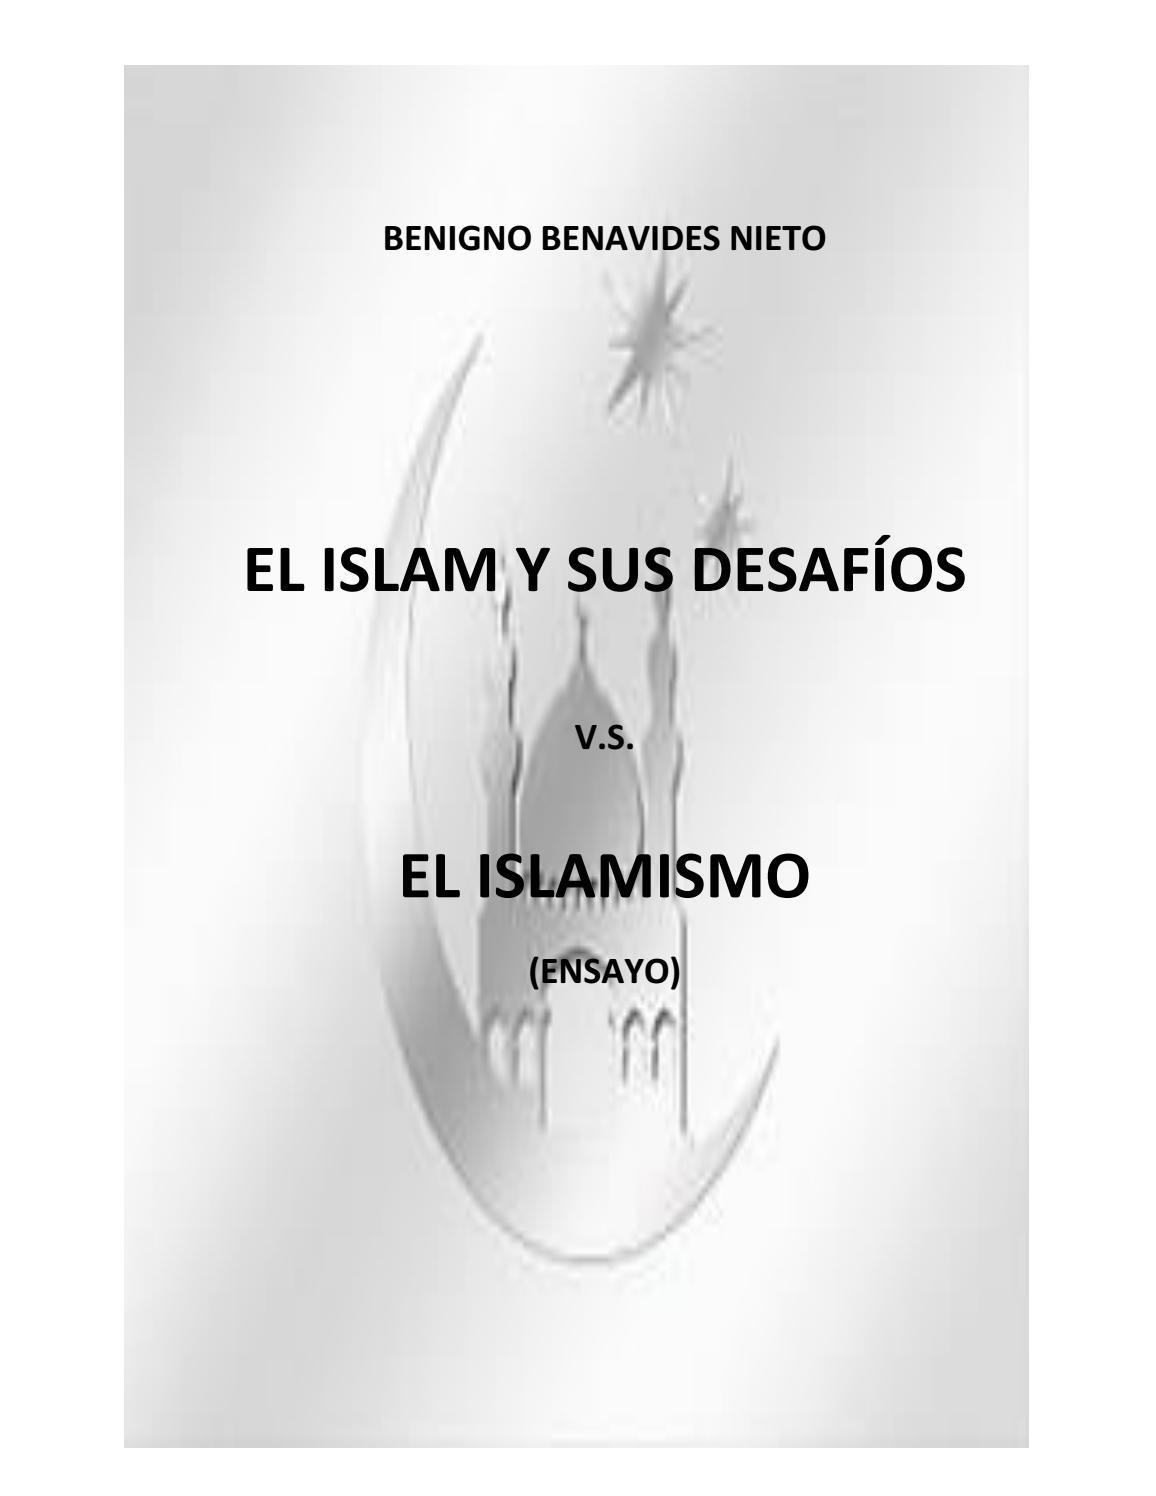 El islam v s el islamismo by Benigno Benavides - issuu